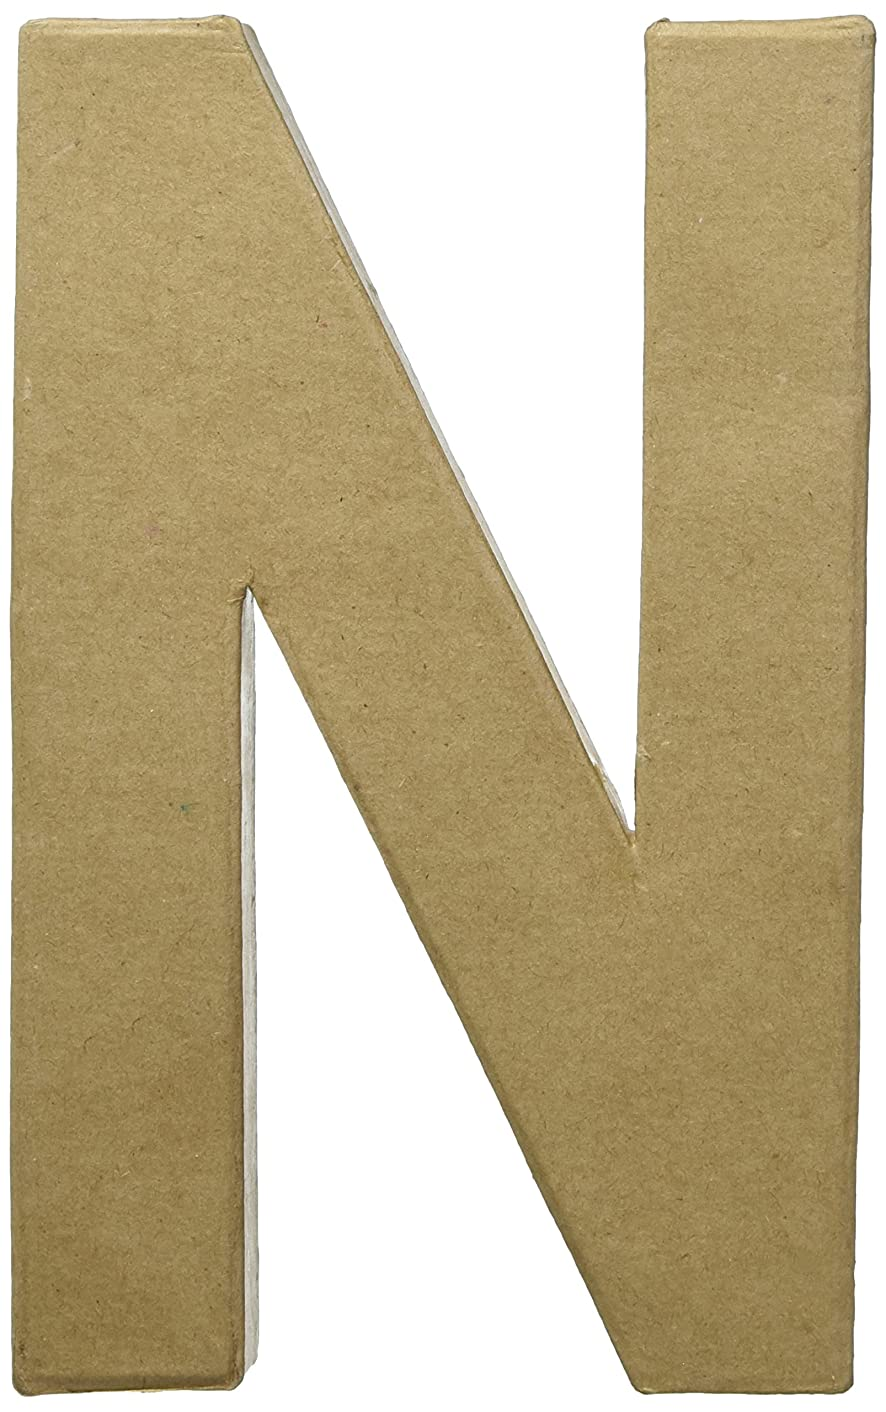 Craft Ped Paper CPL1006251-N.K Mache Letter N Kraft, 8